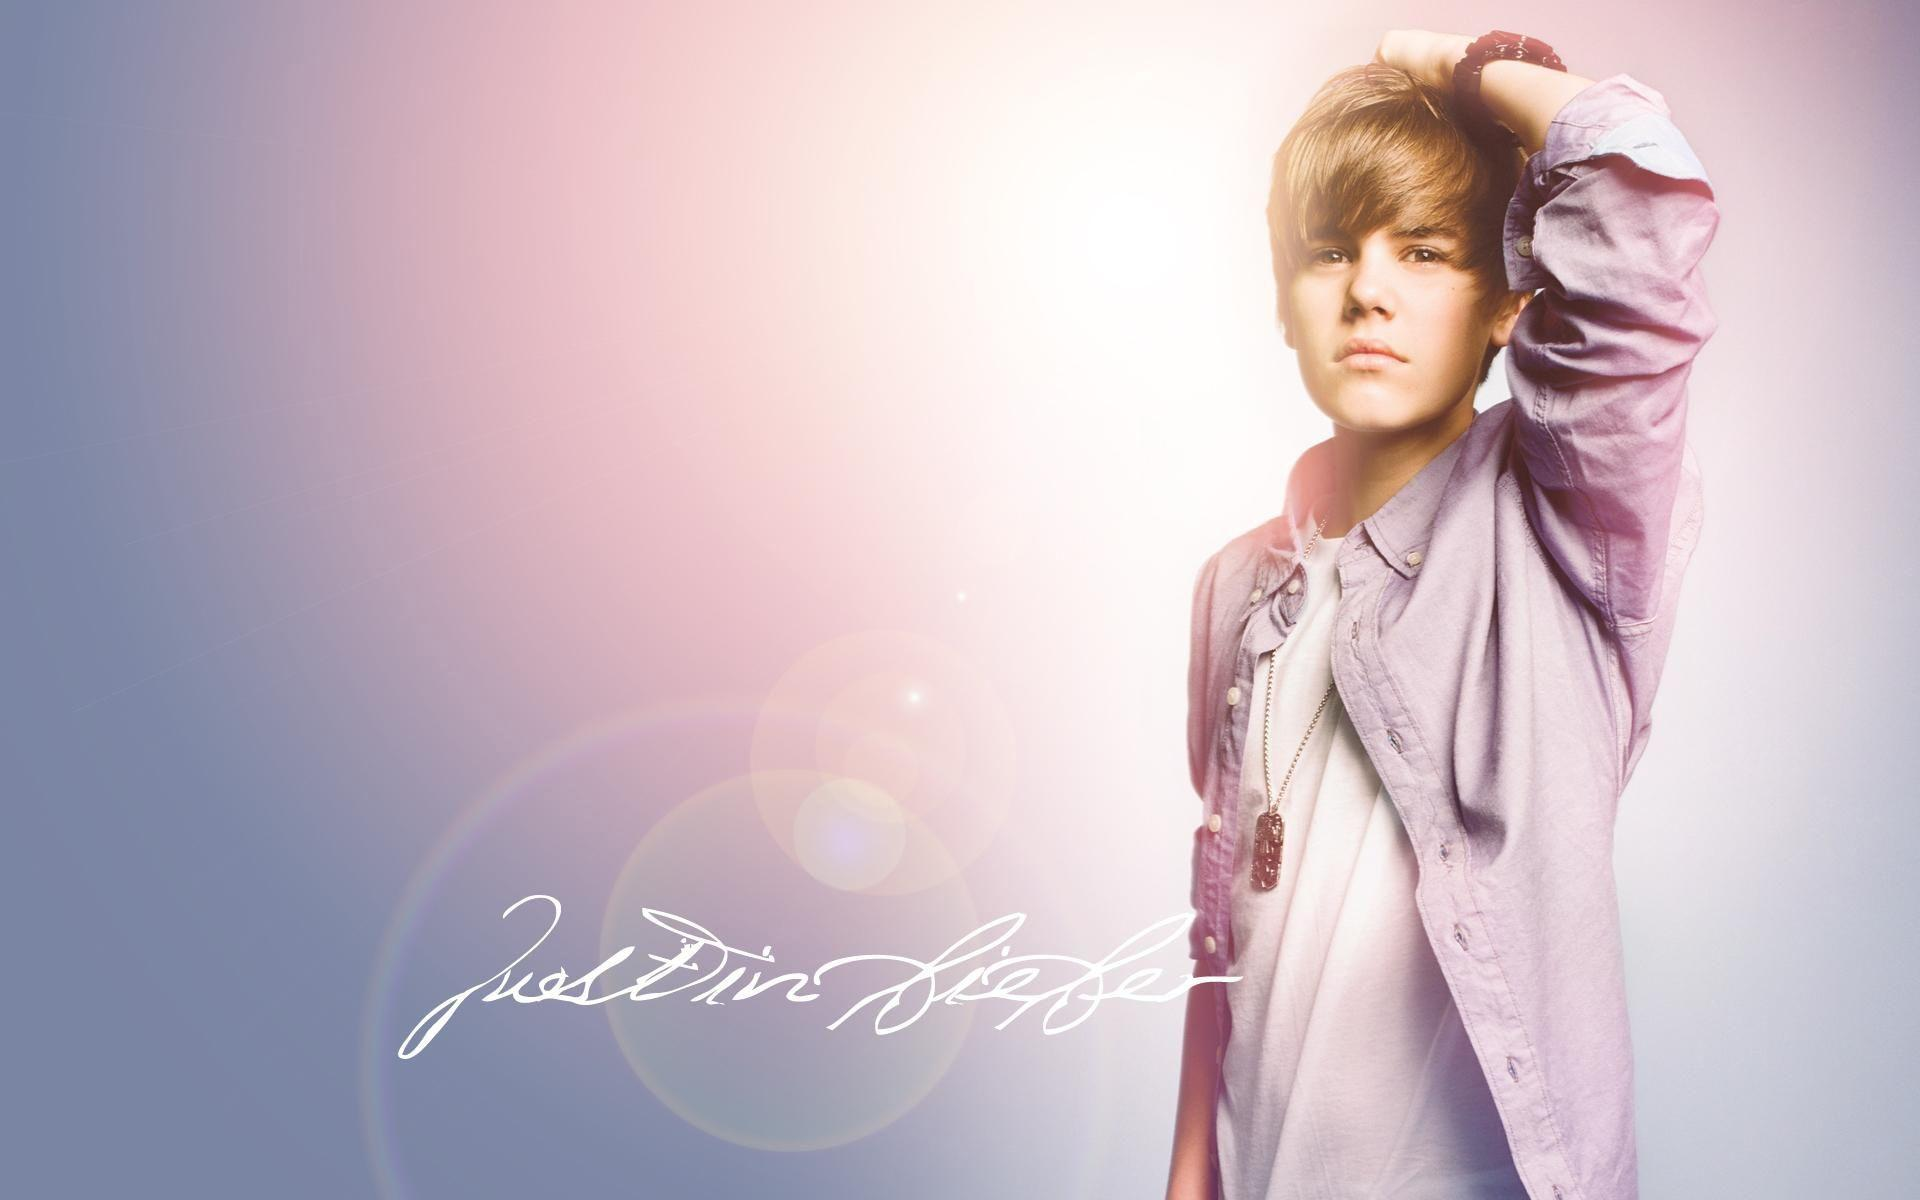 Justin Bieber Wallpapers HD 2016